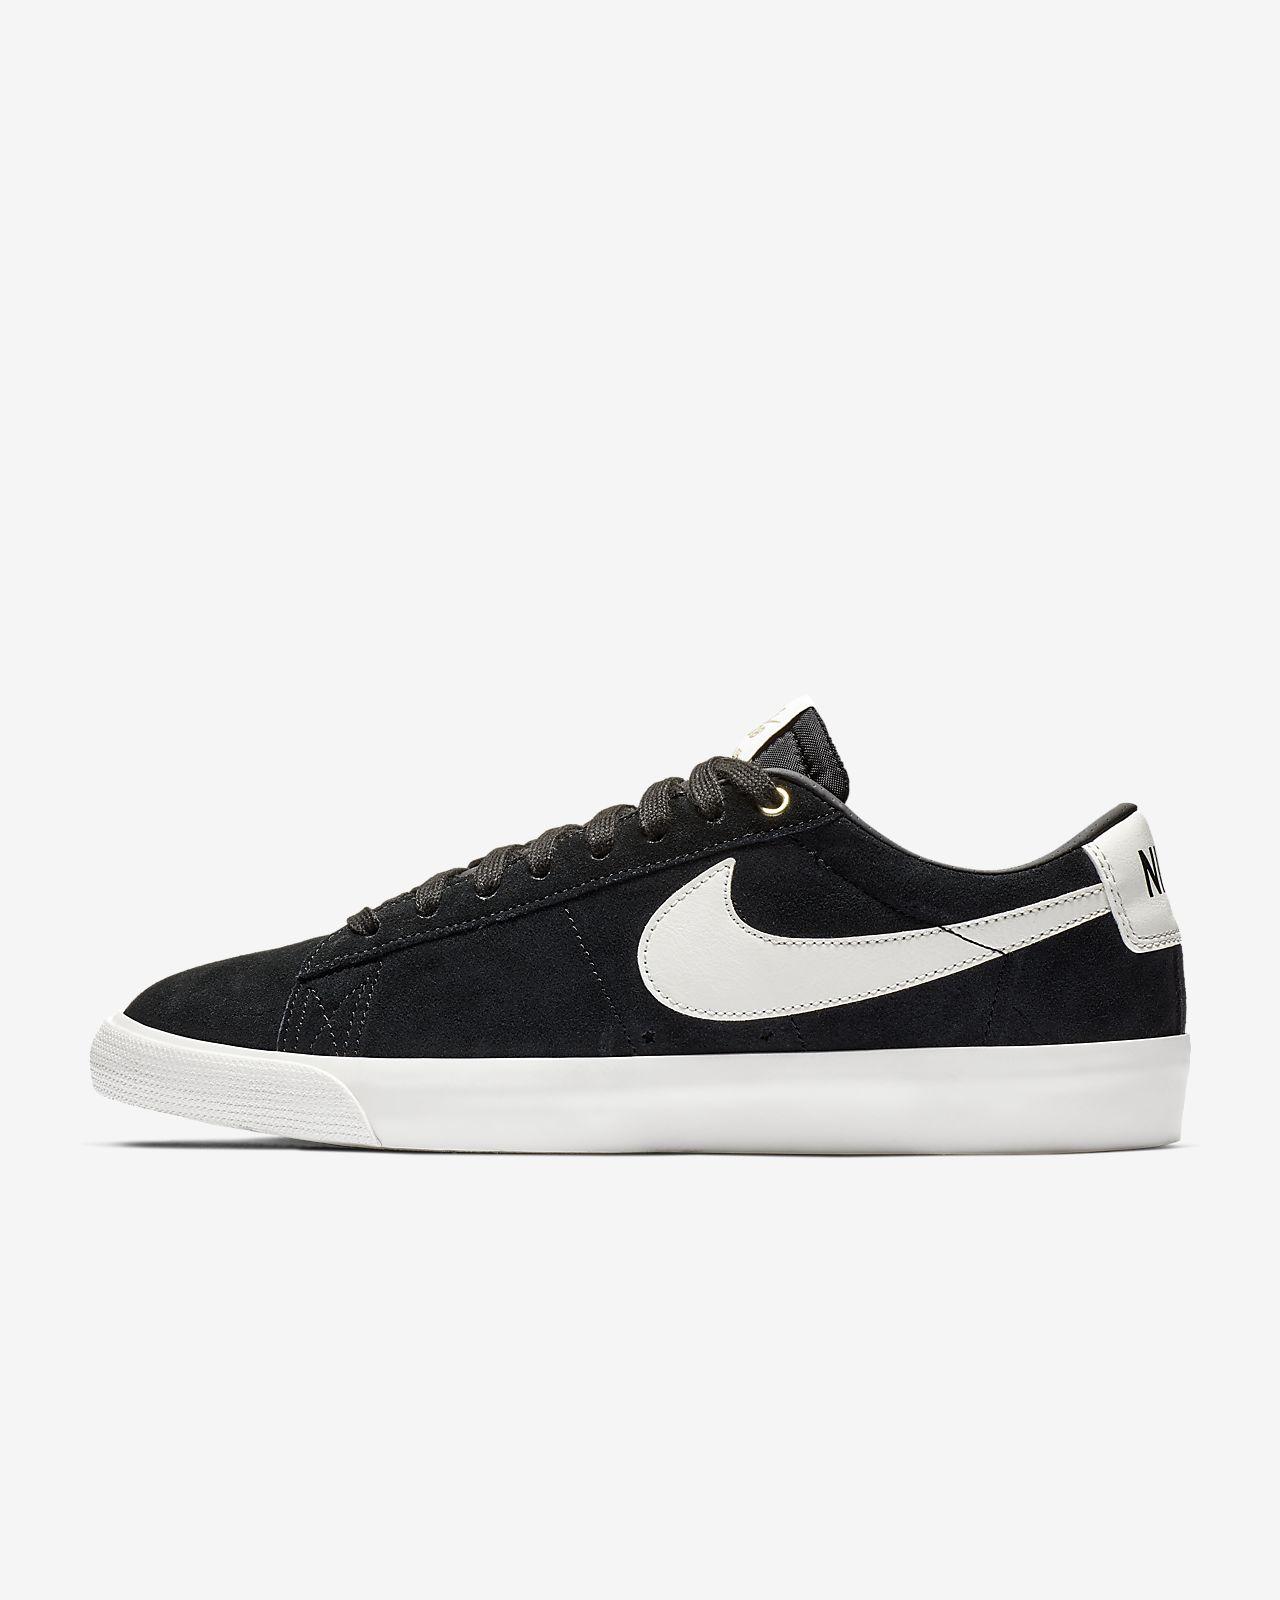 De Skateboard Blazer Chaussure Sb Low Nike Gt zVqUMpS